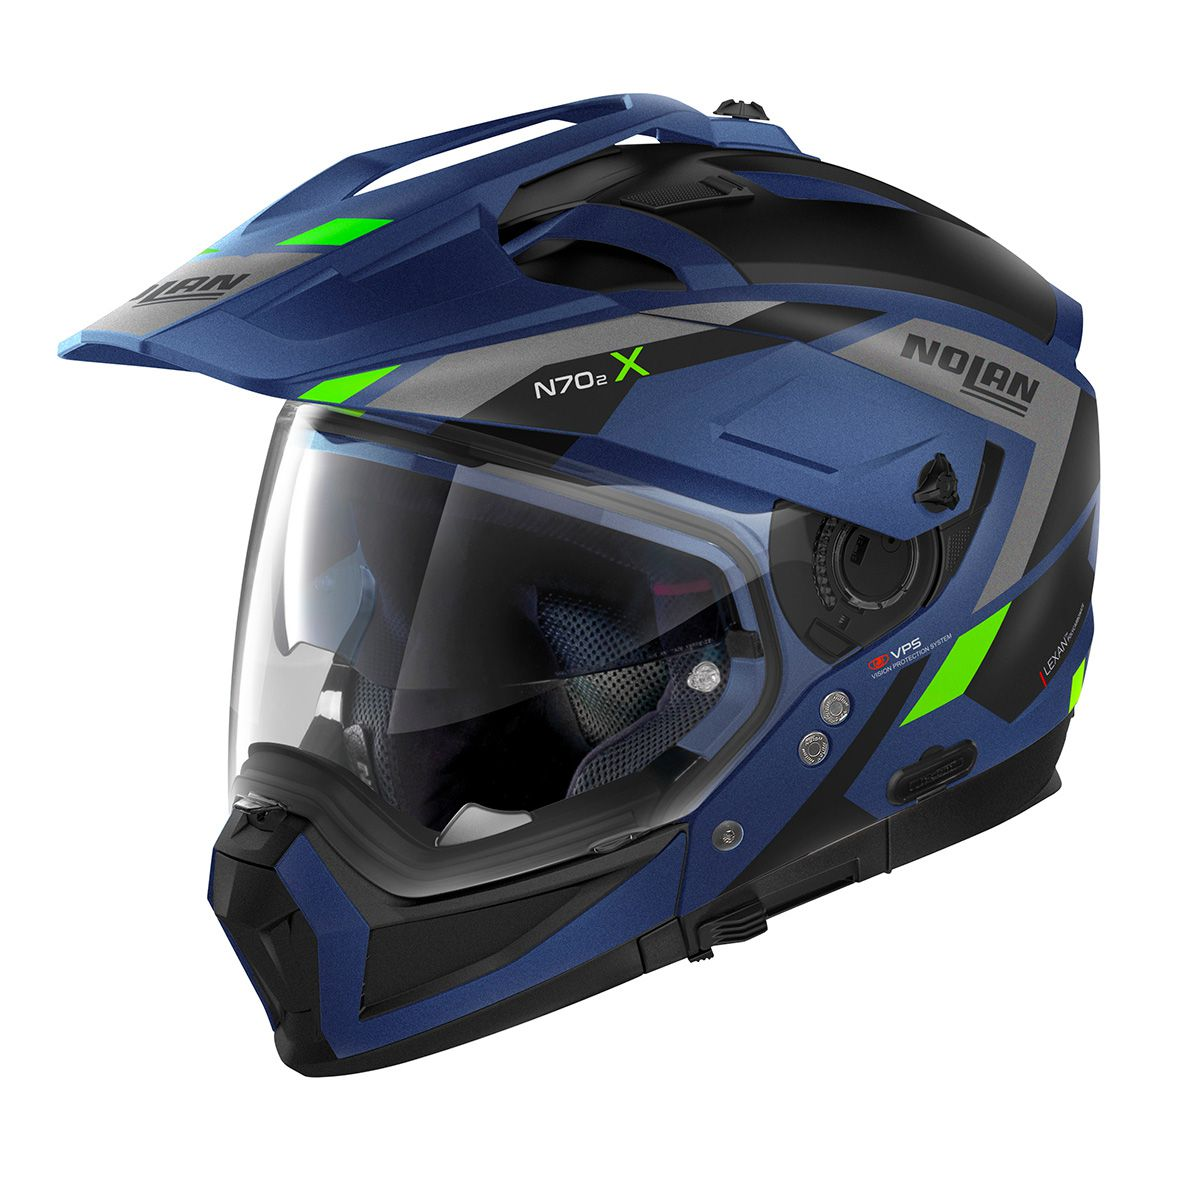 Capacete Nolan N70-2X Grandes Alpes Preto/Azul Fosco Big Trail / Off-Road C/ Viseira Solar - Ganhe Touca Balaclava  - Motosports